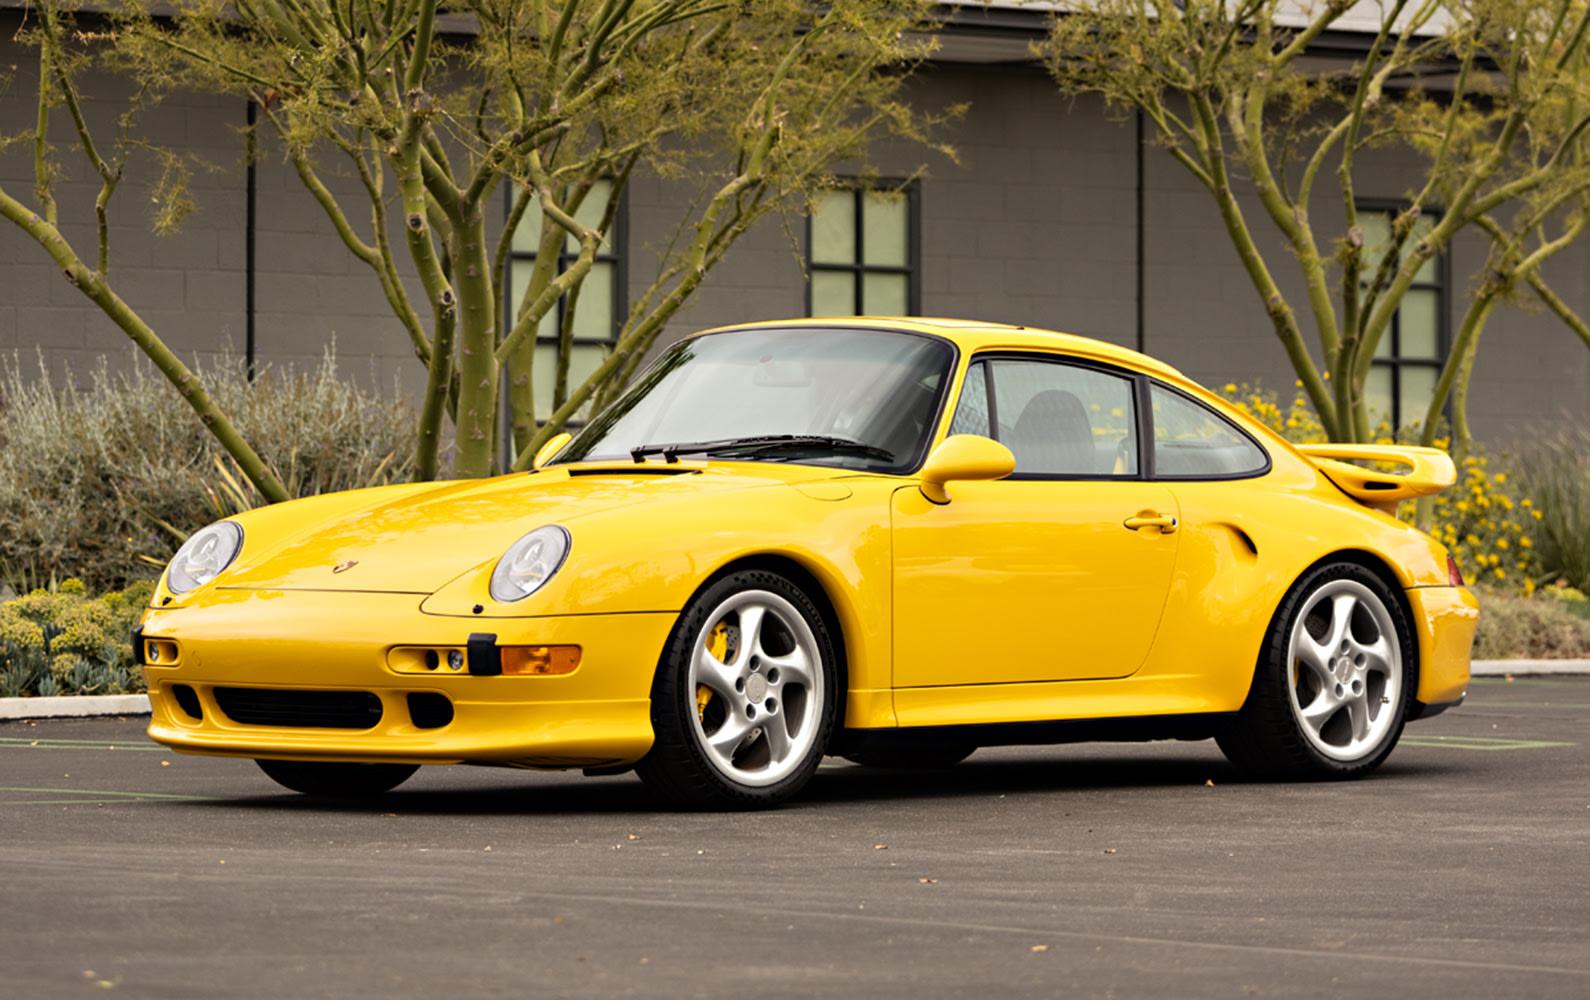 Prod/O21F - May 2021/1514_1997 Porsche Turbo S/1997_Porsche_993_Turbo_S_8_eo8ka4